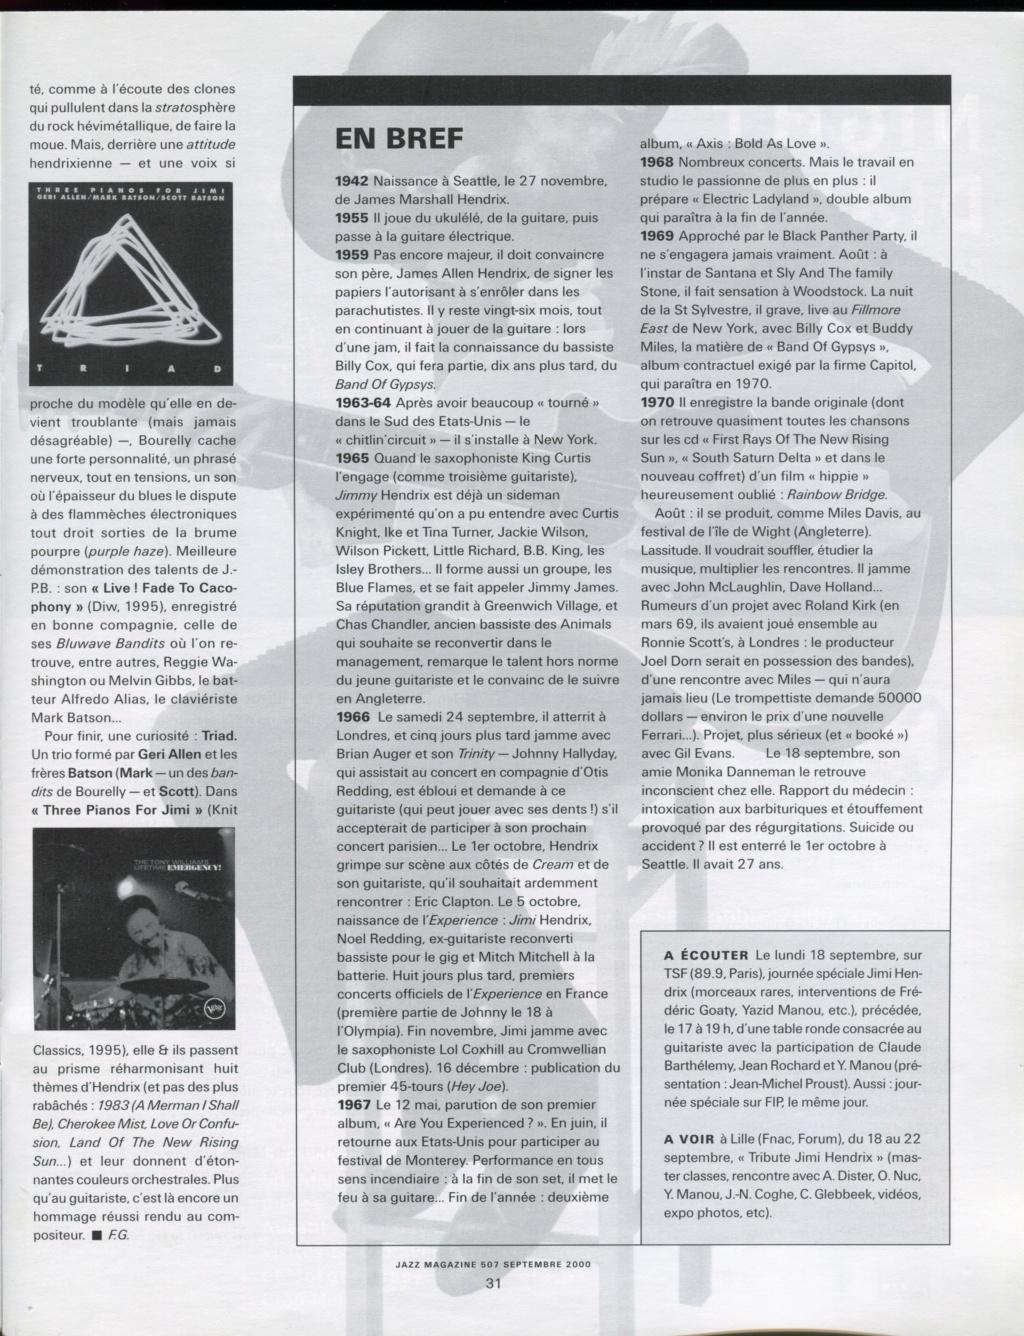 Magazines Français 1989 - 2014 - Page 2 1990_149